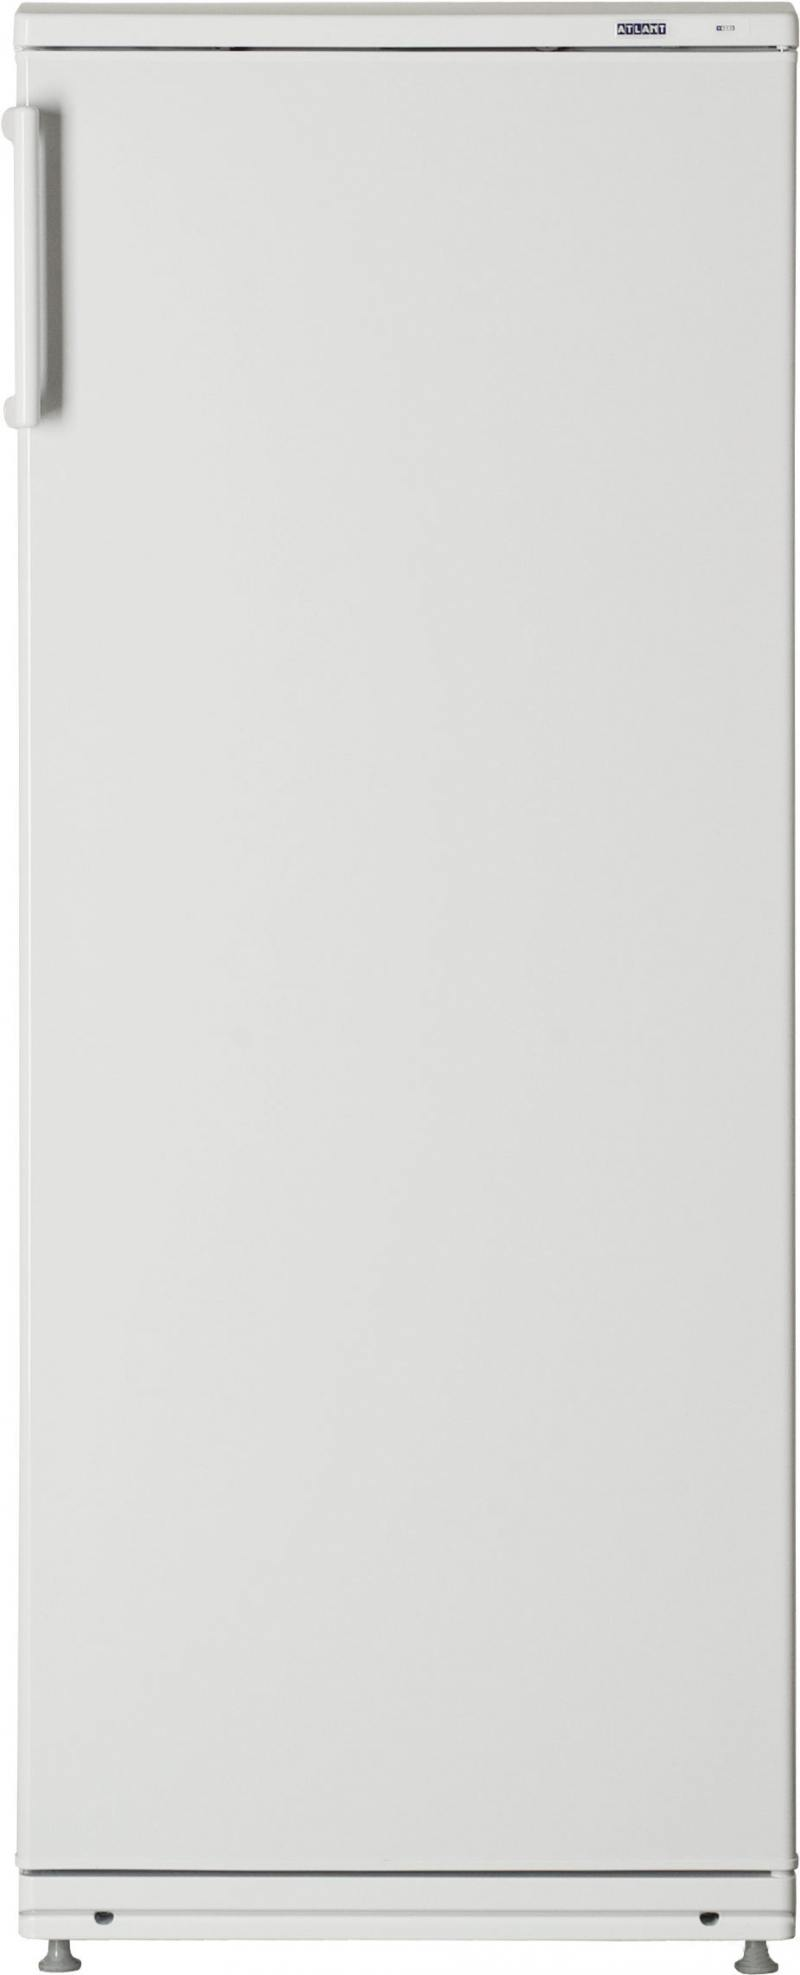 все цены на Холодильник ATLANT 2823-80 онлайн